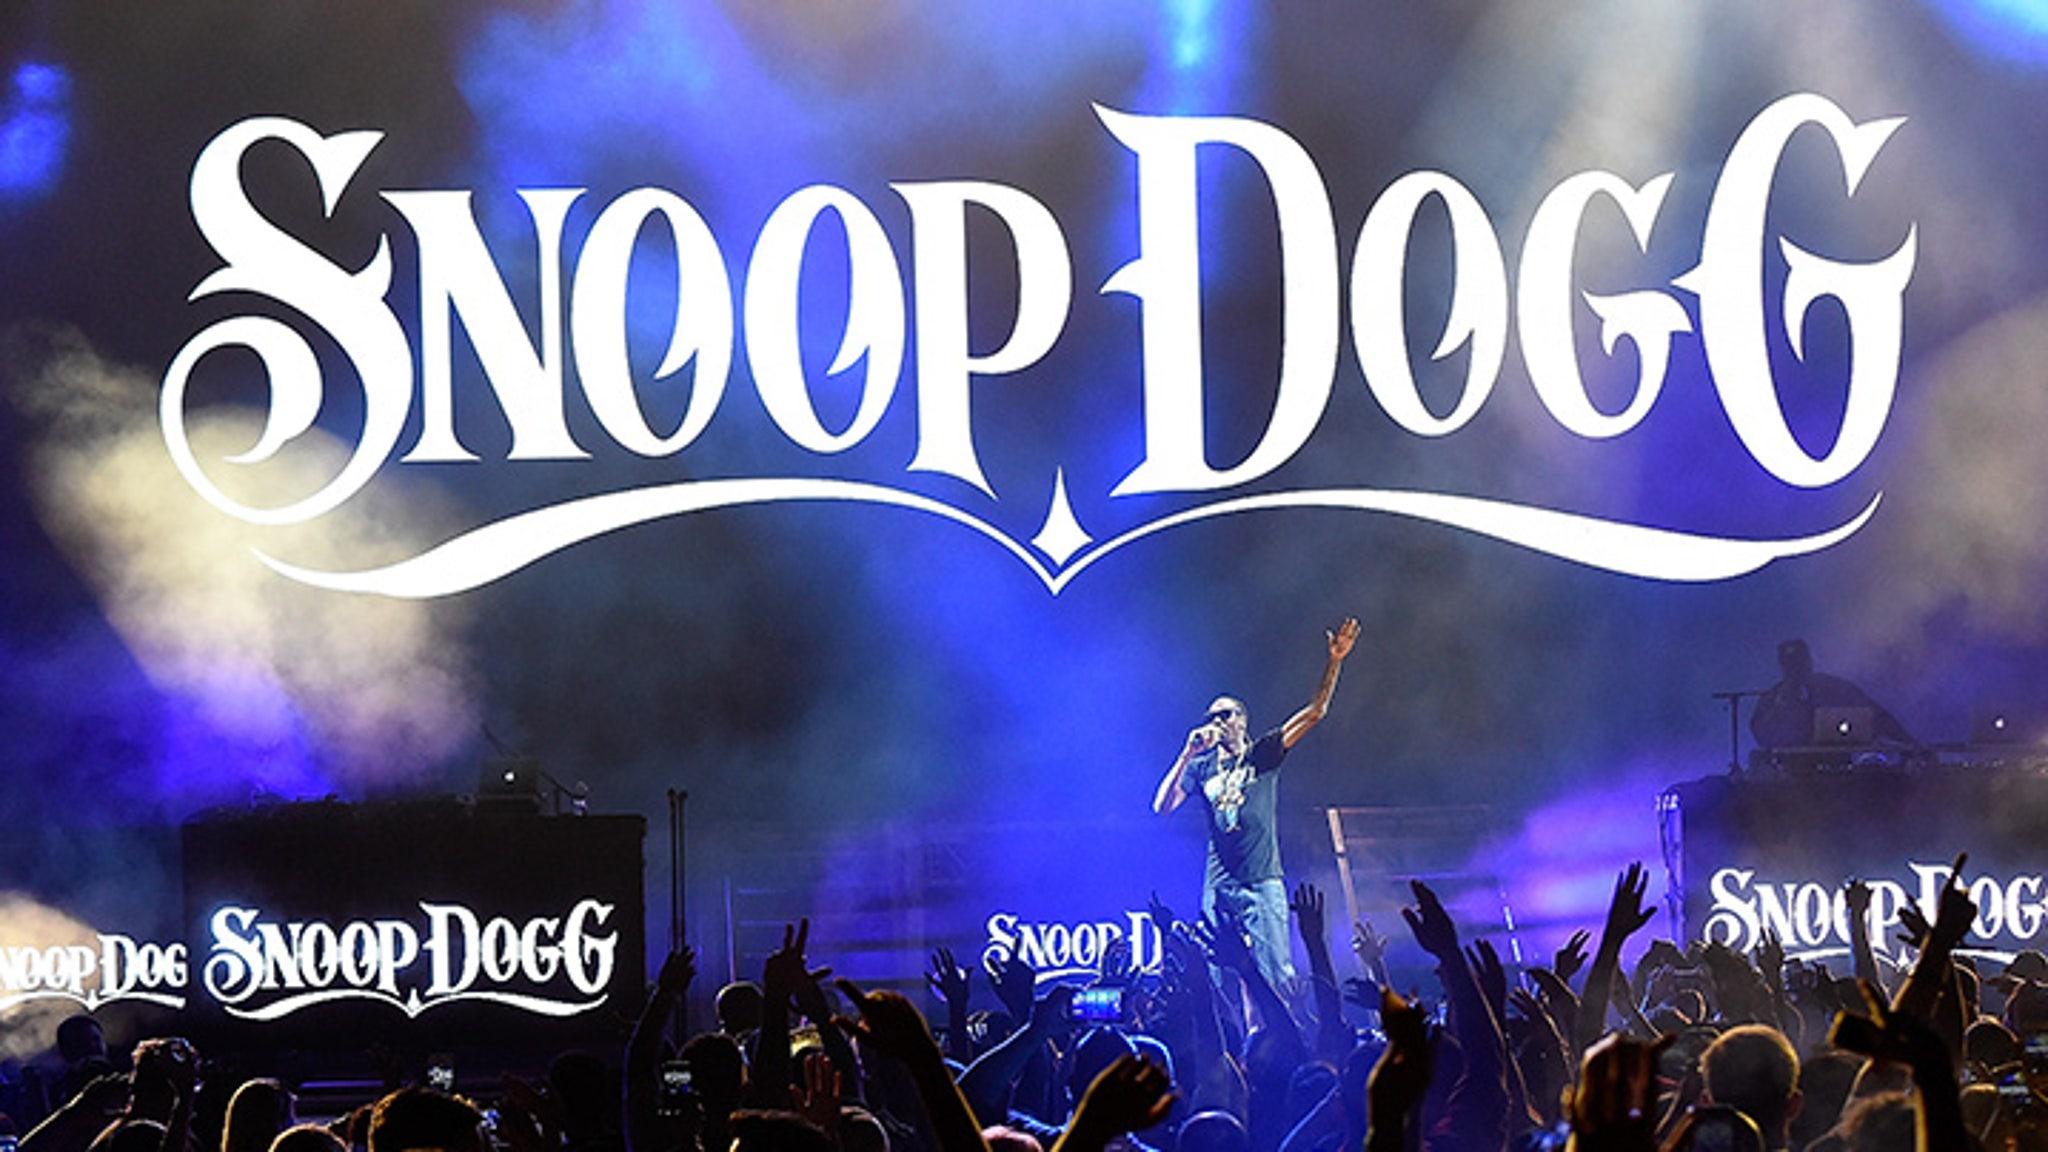 11 Kids Hospitalized During Snoop Dogg & Wiz Khalifa Concert